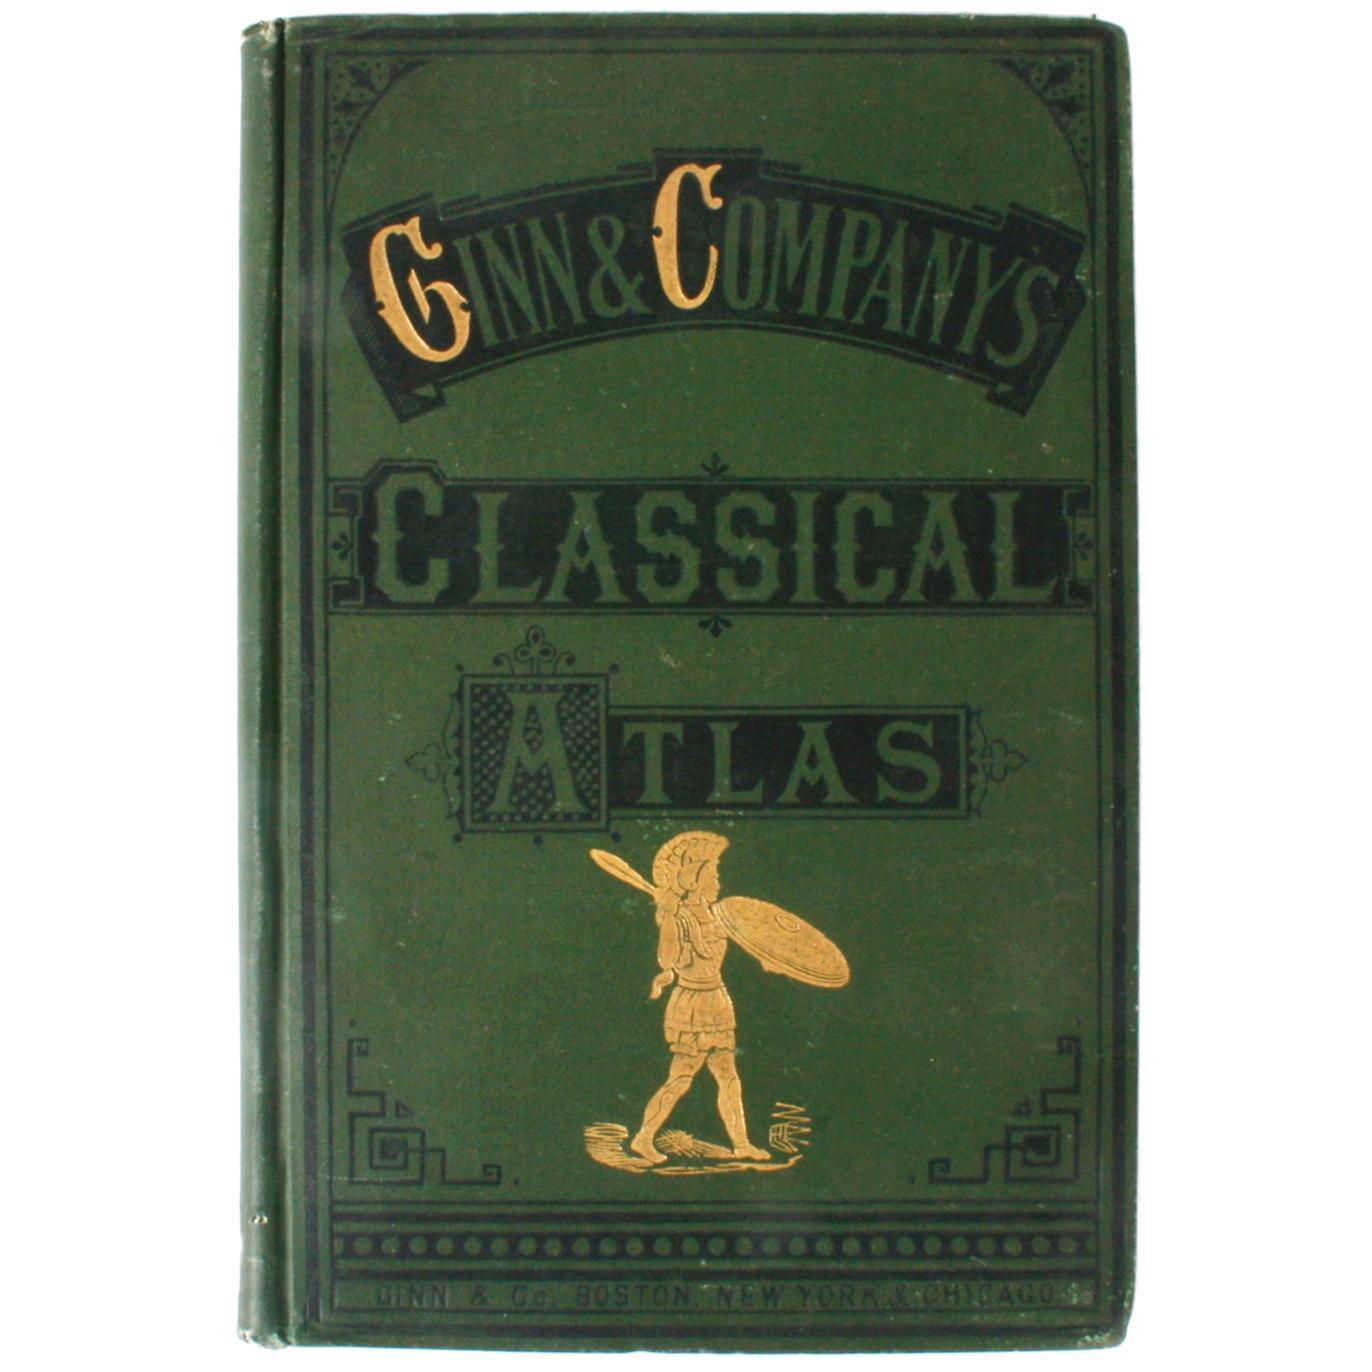 Ginn & Company's Classical Atlas by Ginn & Company, First Edition